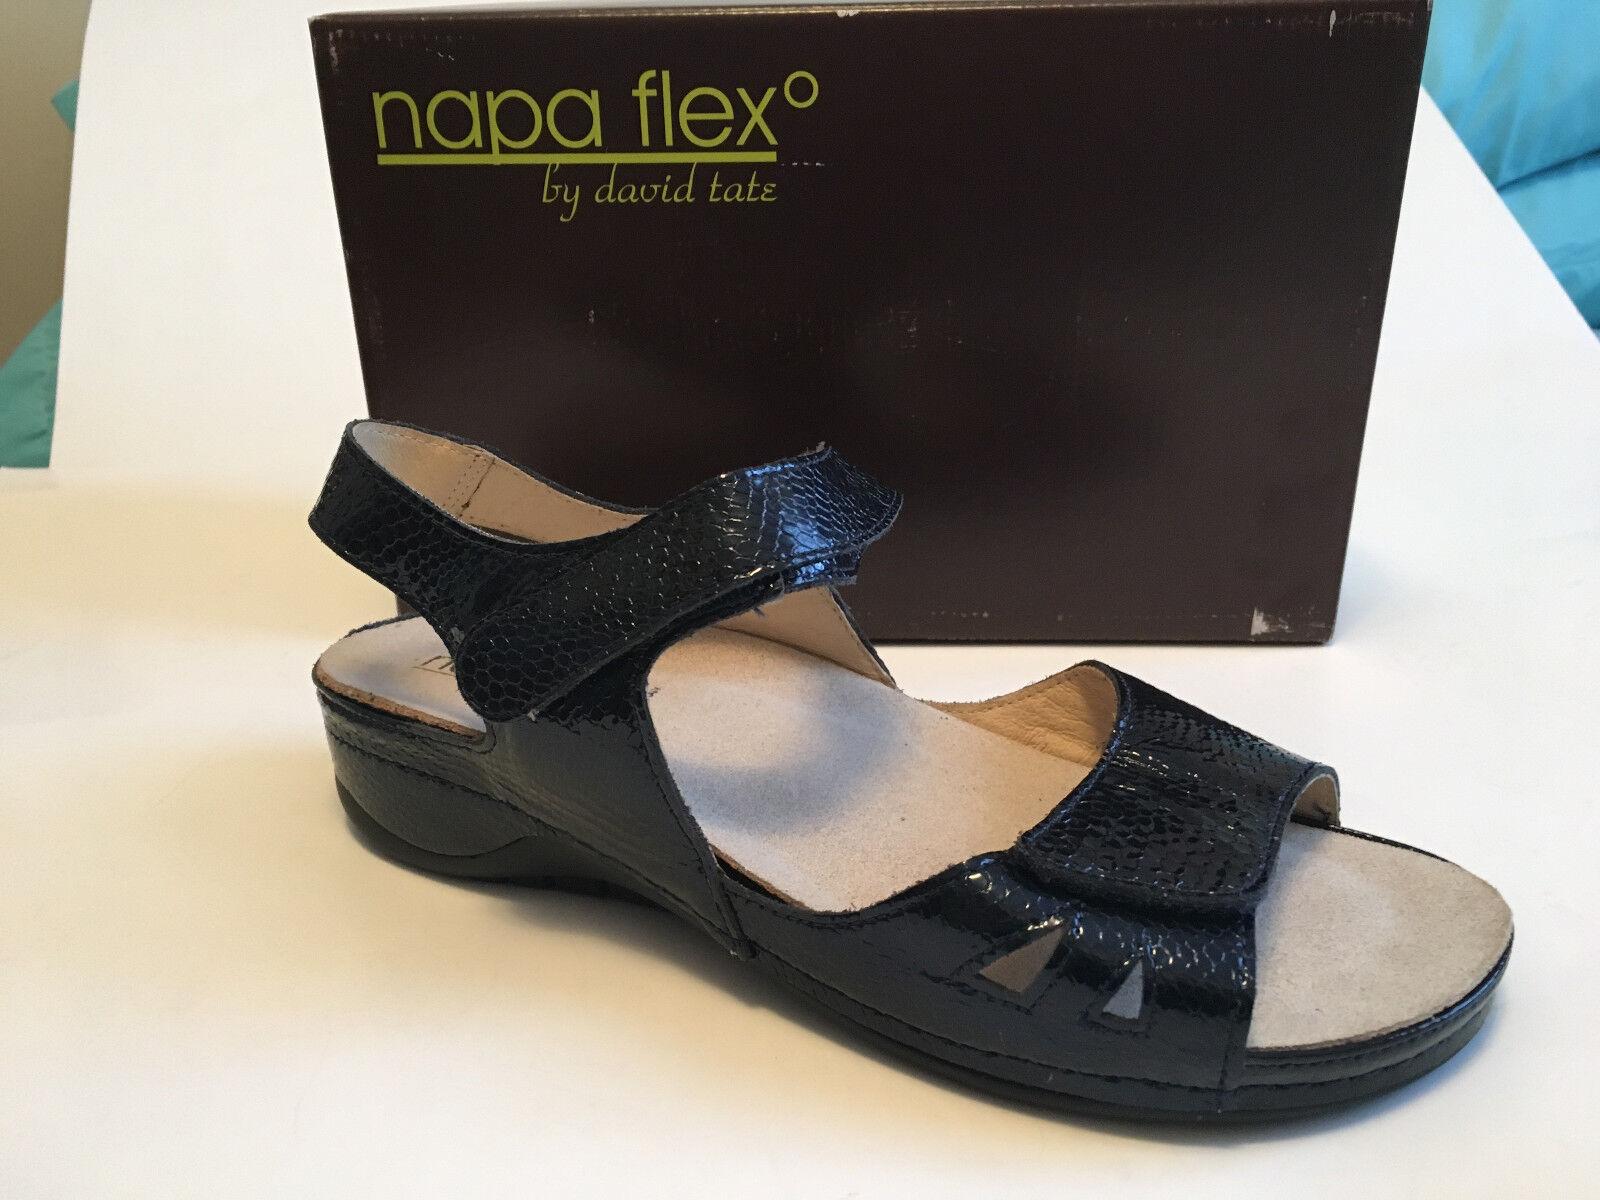 NAPPA FLEX by David Tate women's navy snake print comfort sandals 8.5M EUR39